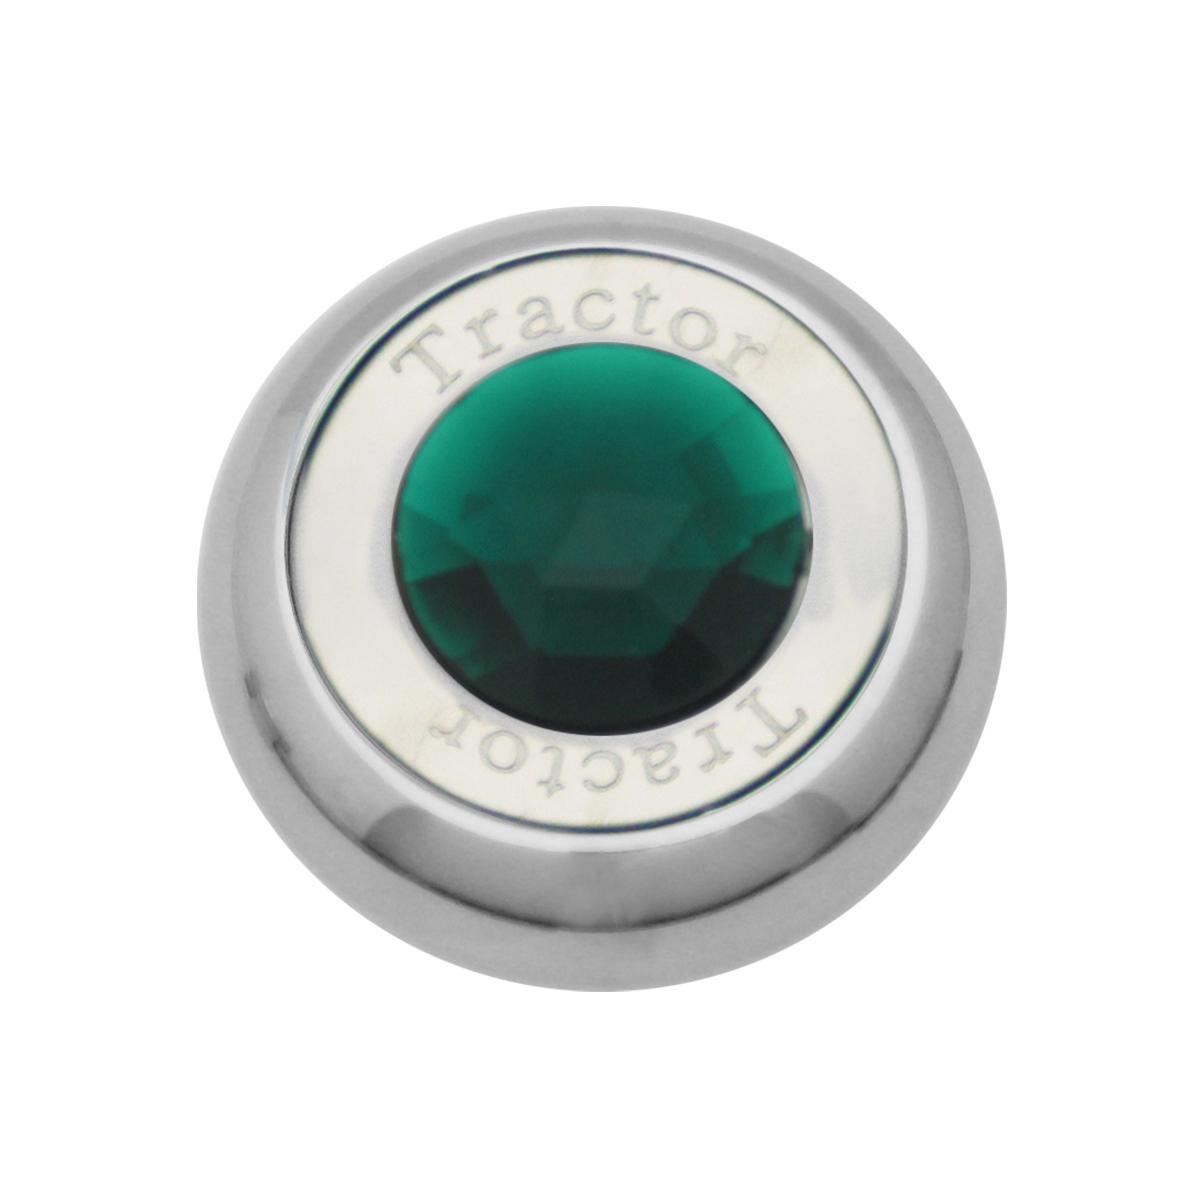 95373 Chrome Screw-In Air Valve Control Knob w/ Crystal